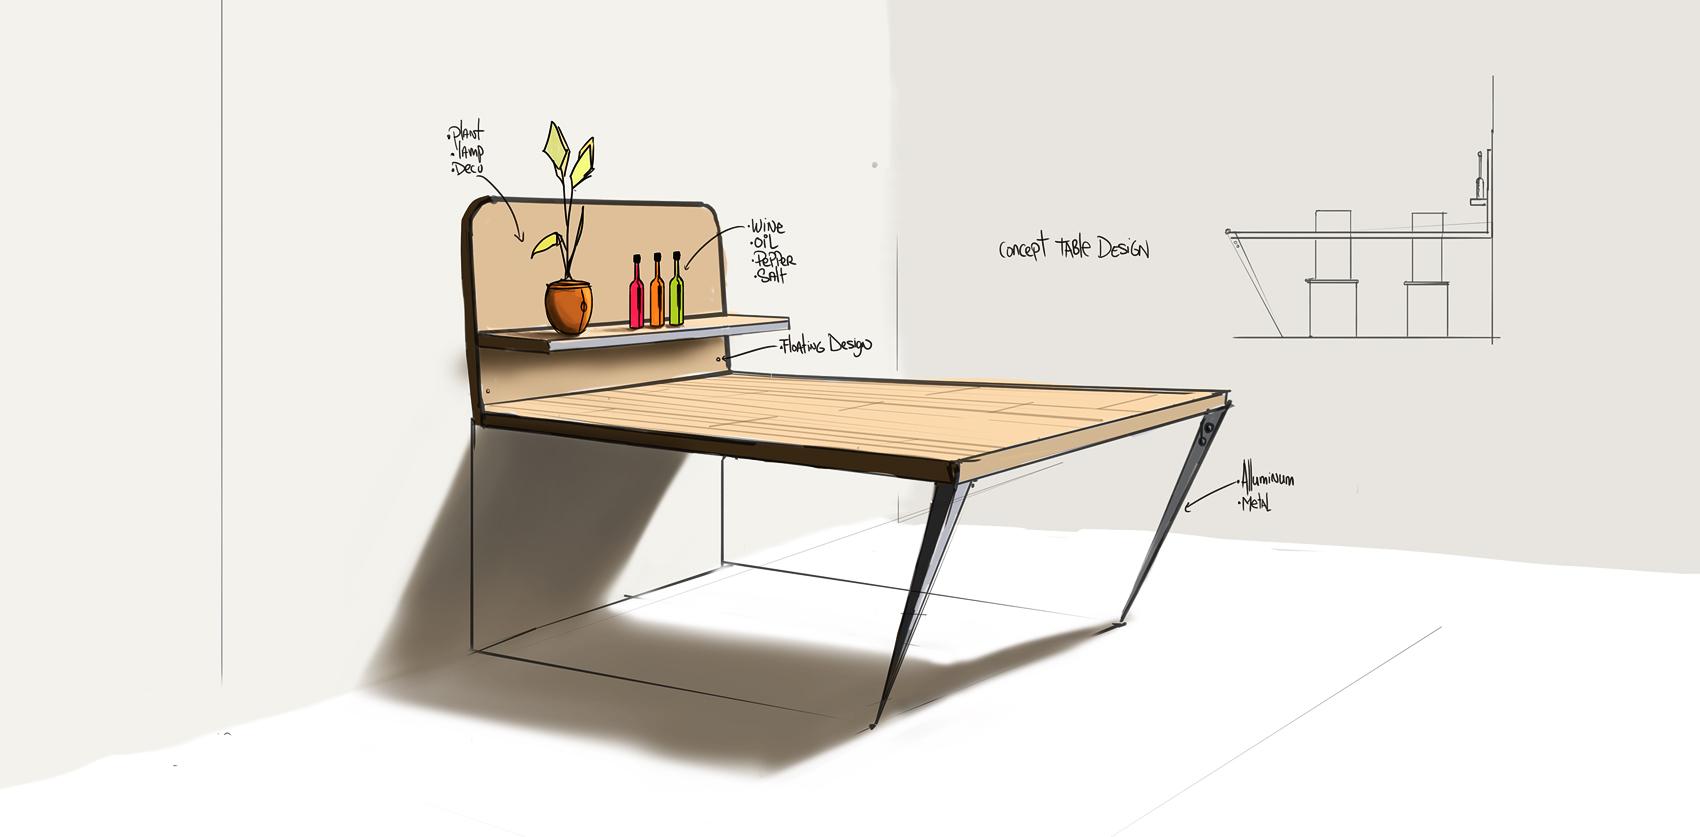 coffee table design concept photo - 3